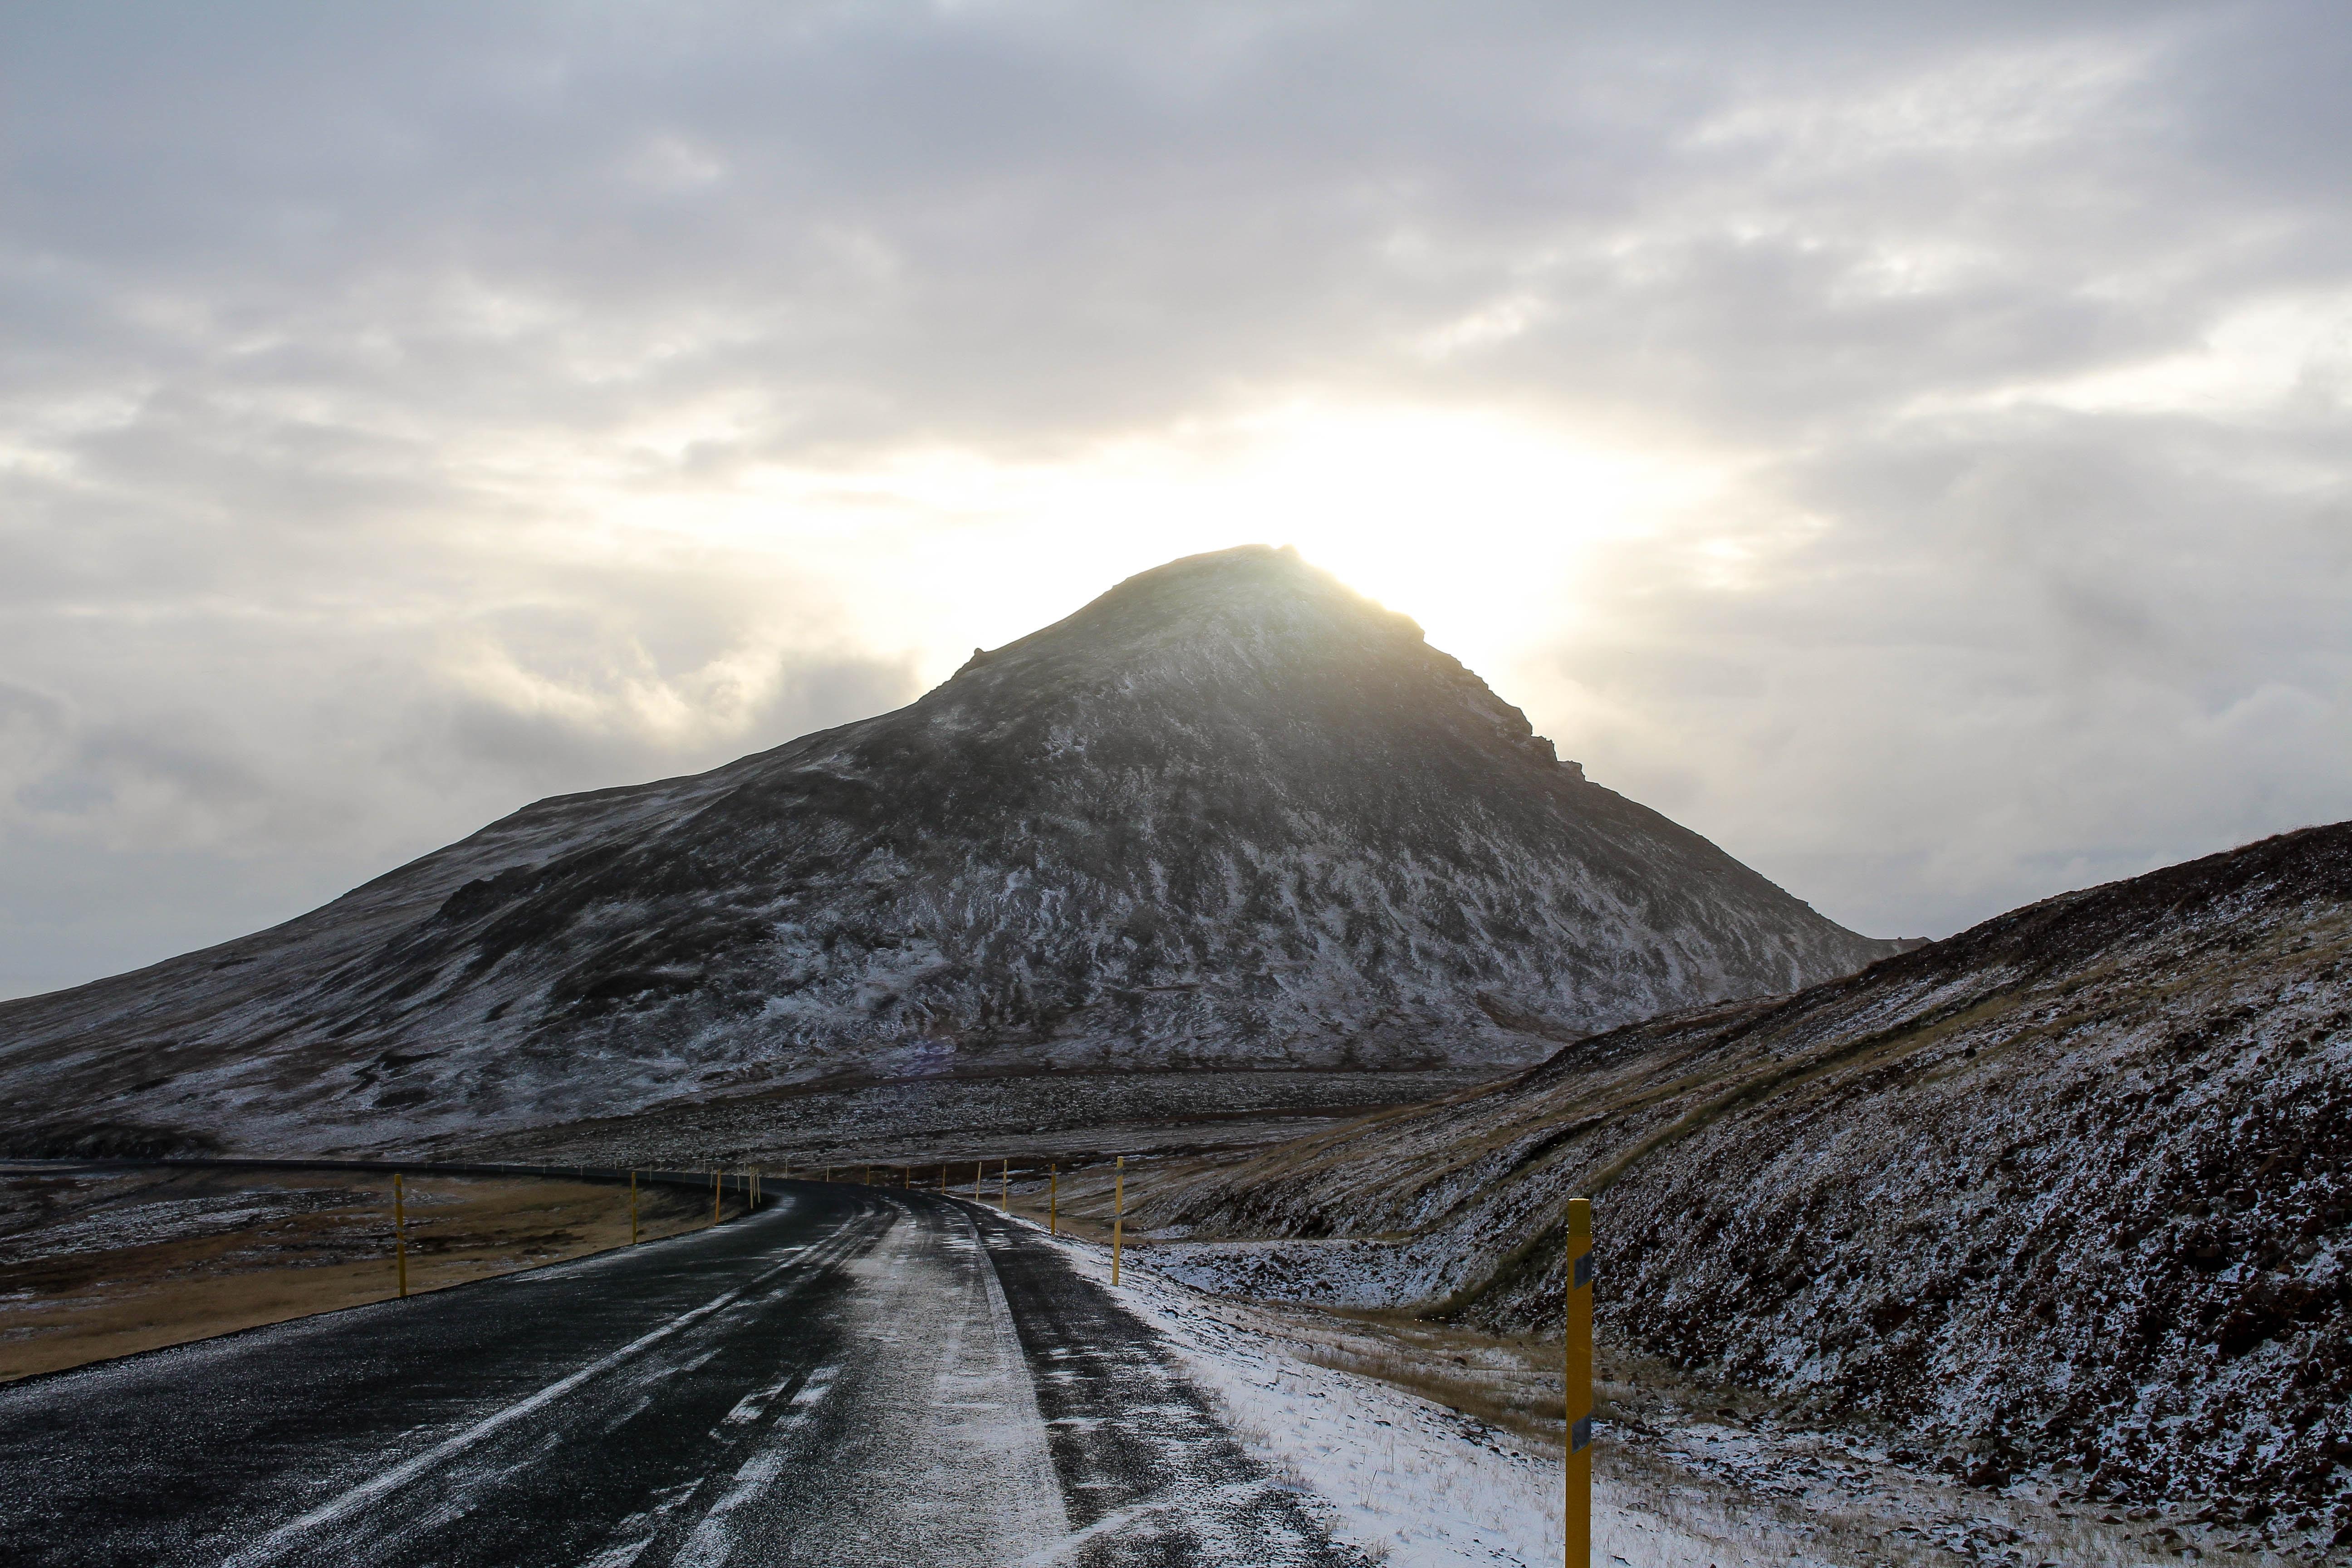 mountain near asphalt road during daytime